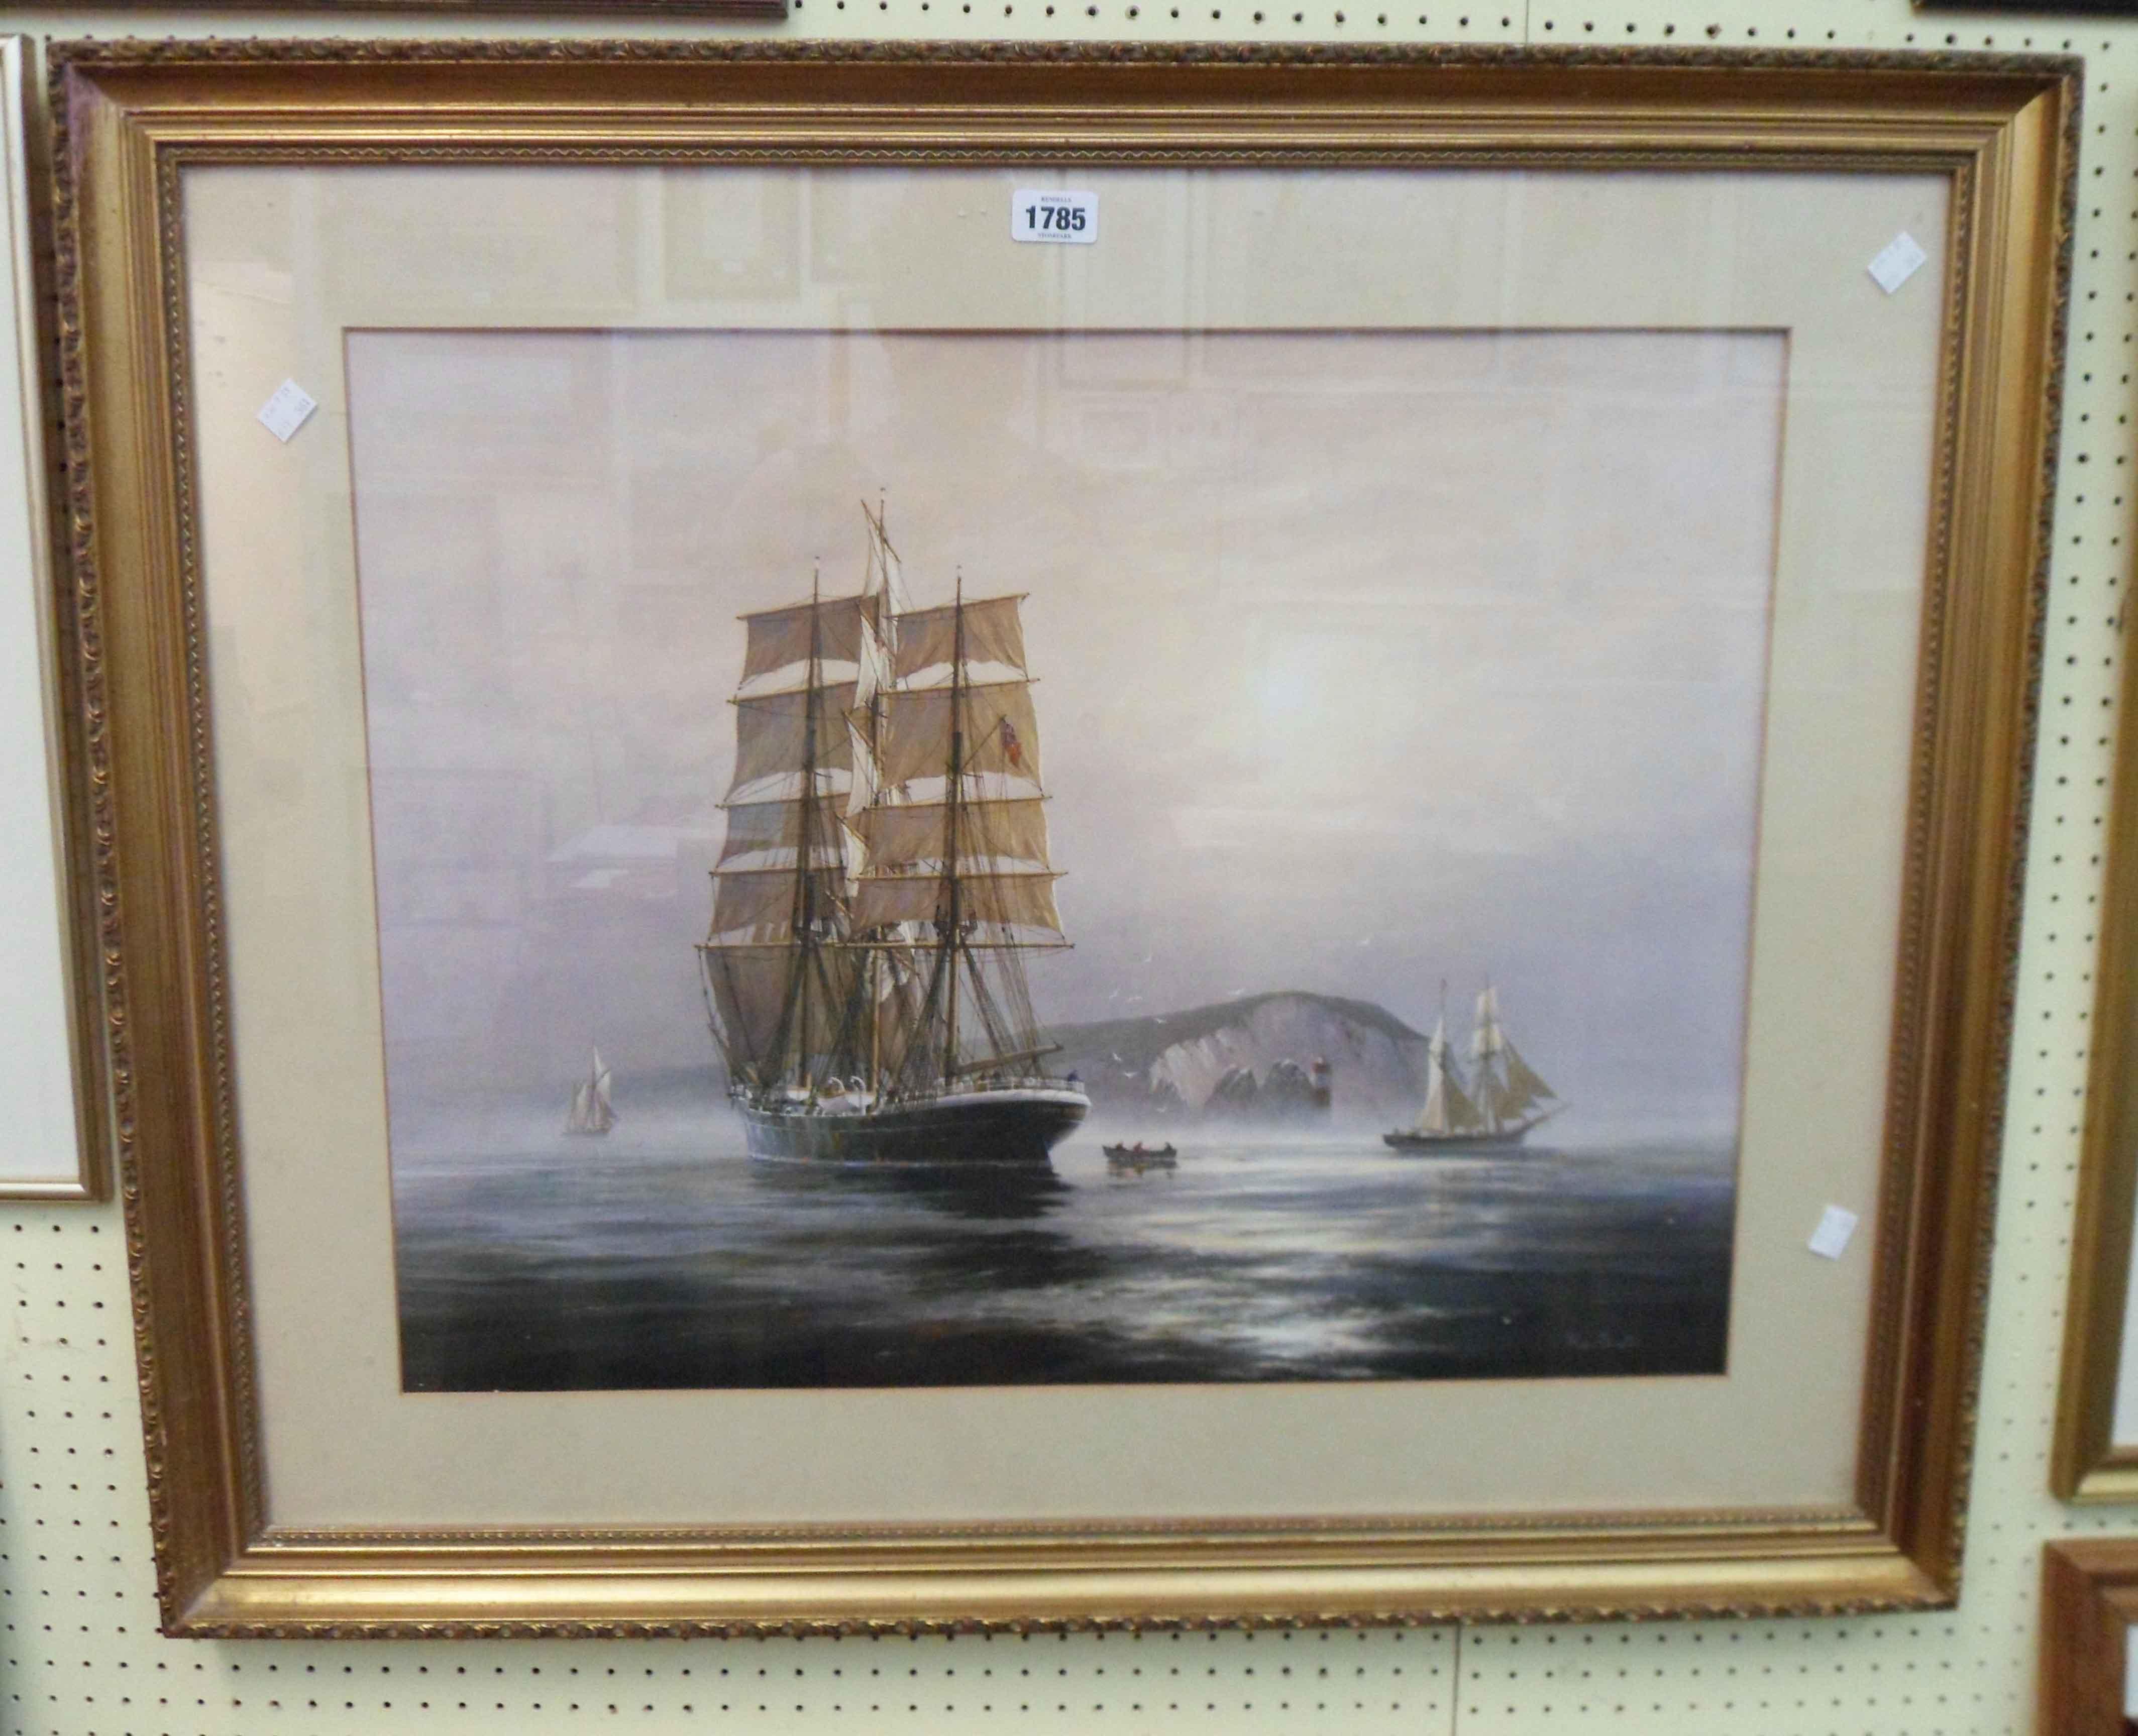 Roger Desoutter: a gilt framed large format coloured print, depicting sailing vessels and a rowing